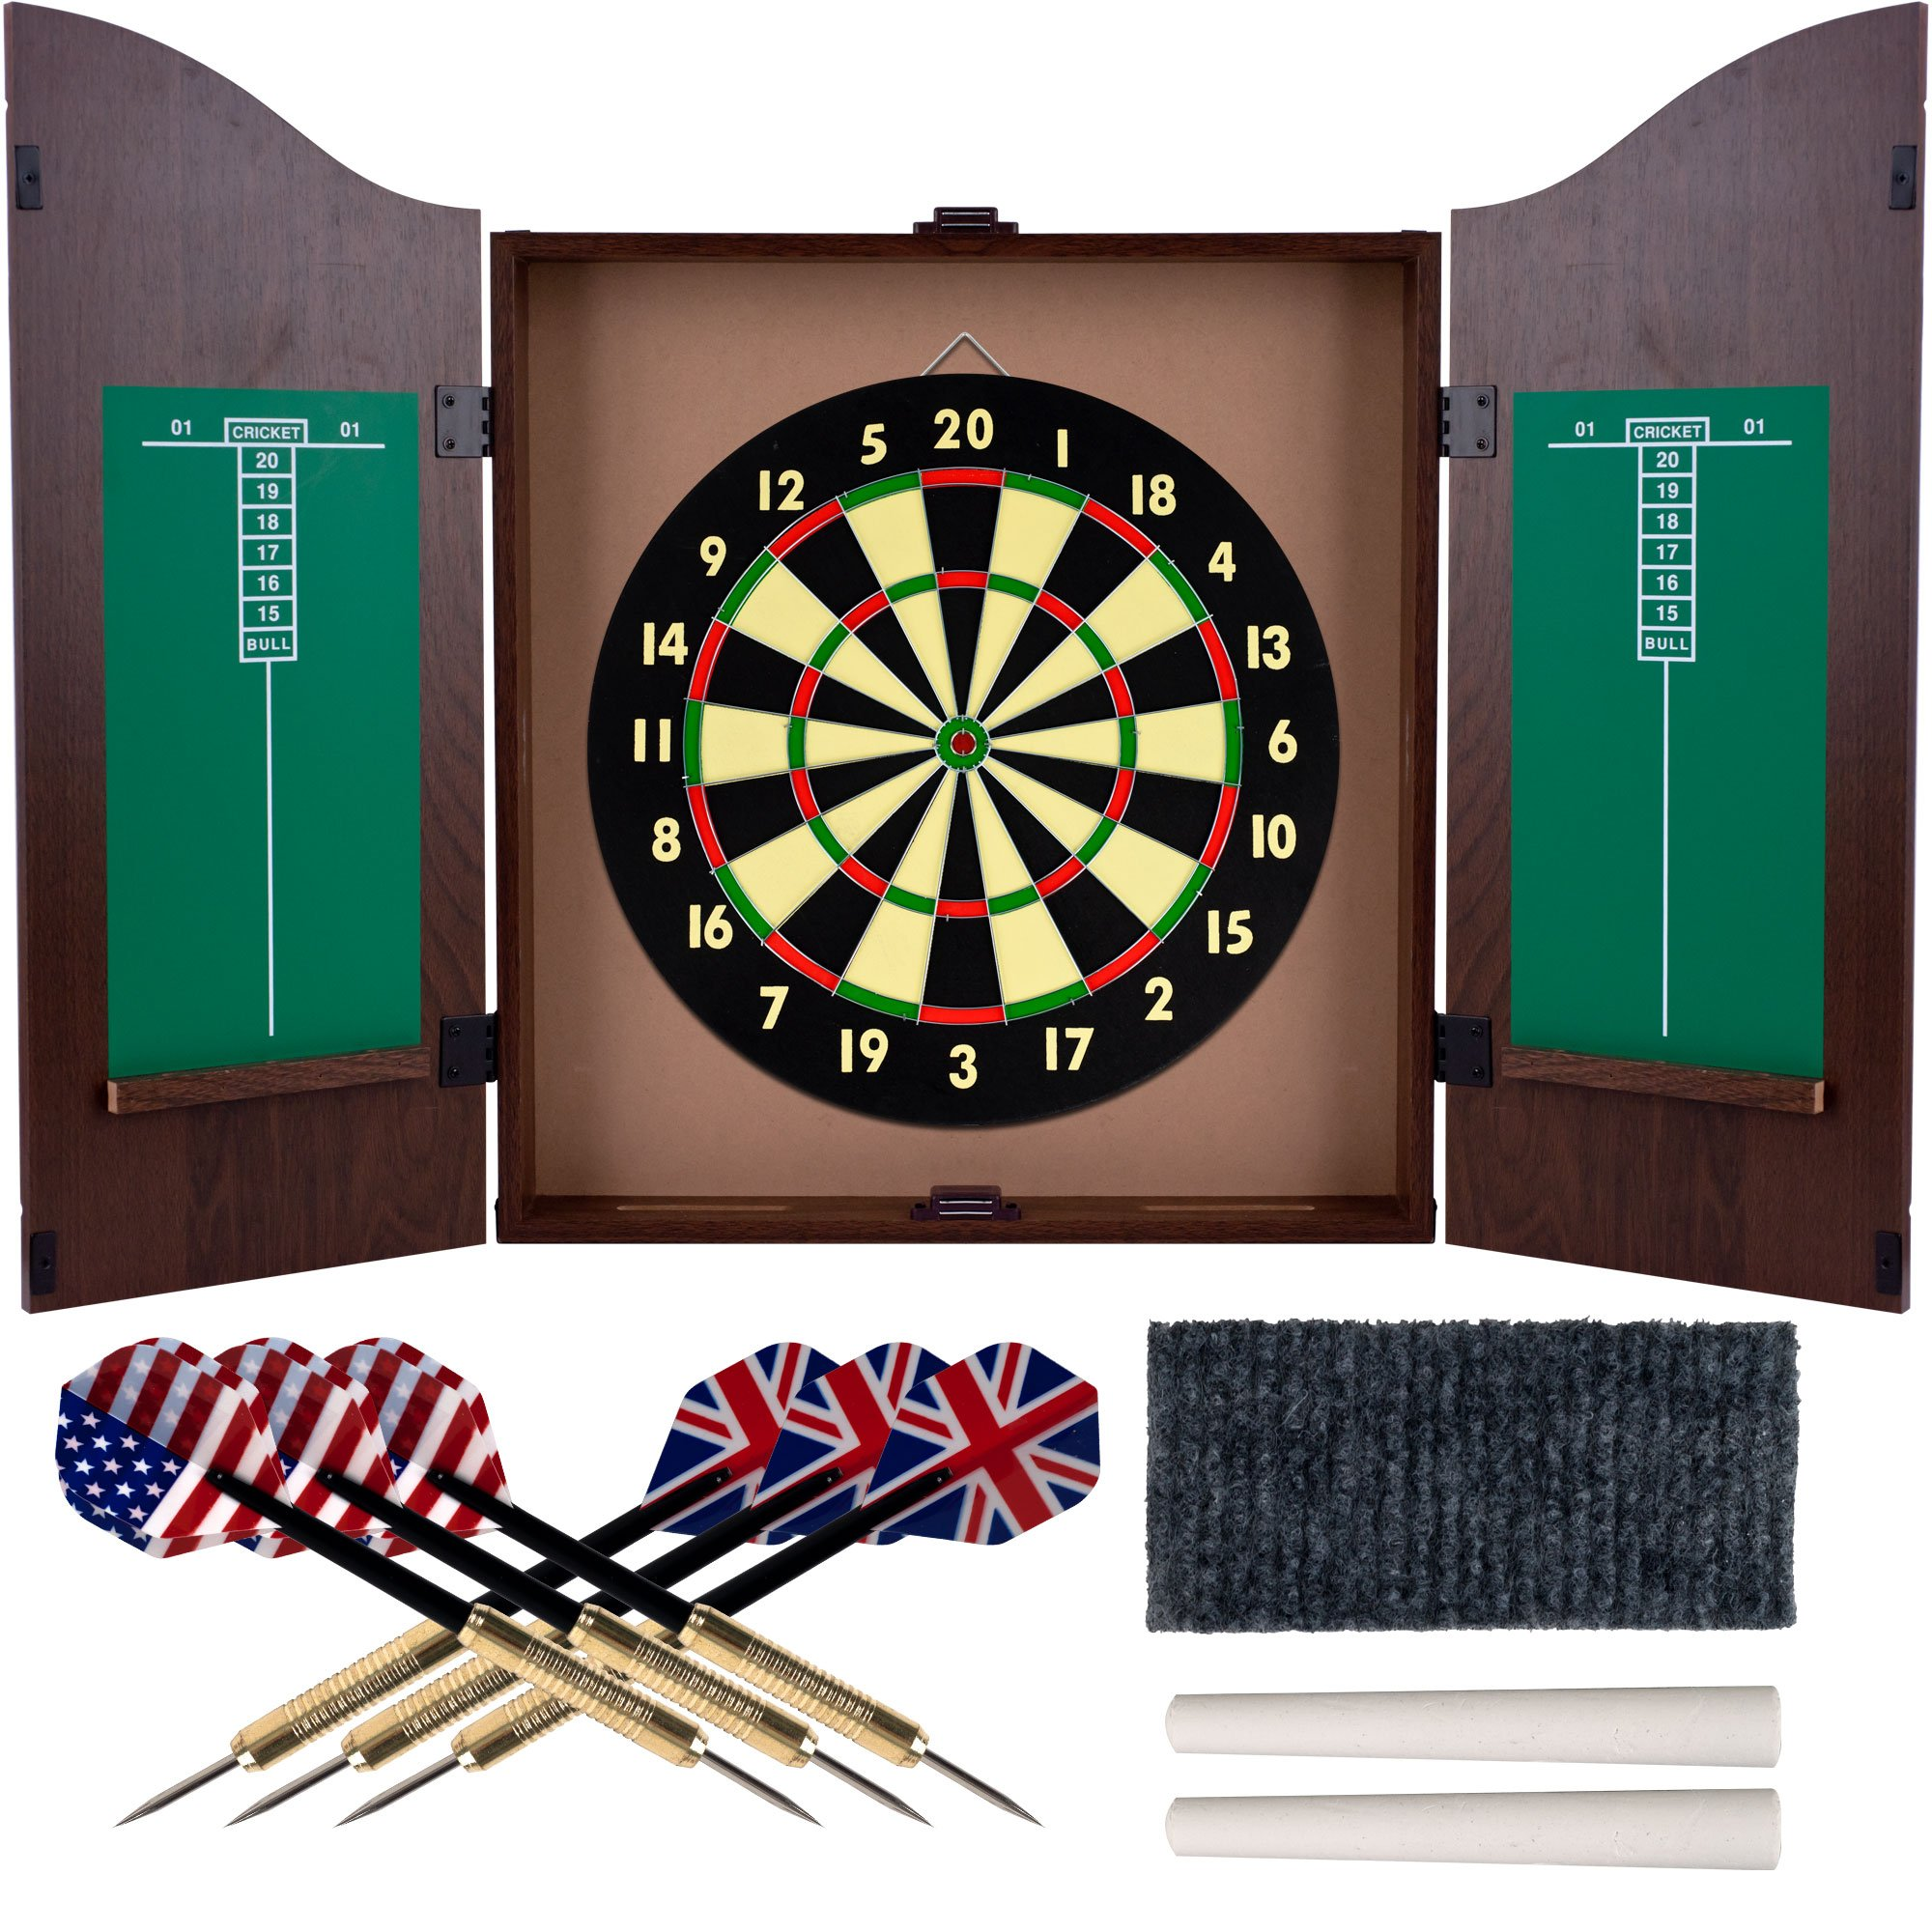 Trademark Gameroom Dartboard Cabinet Set with Realistic Walnut Finish